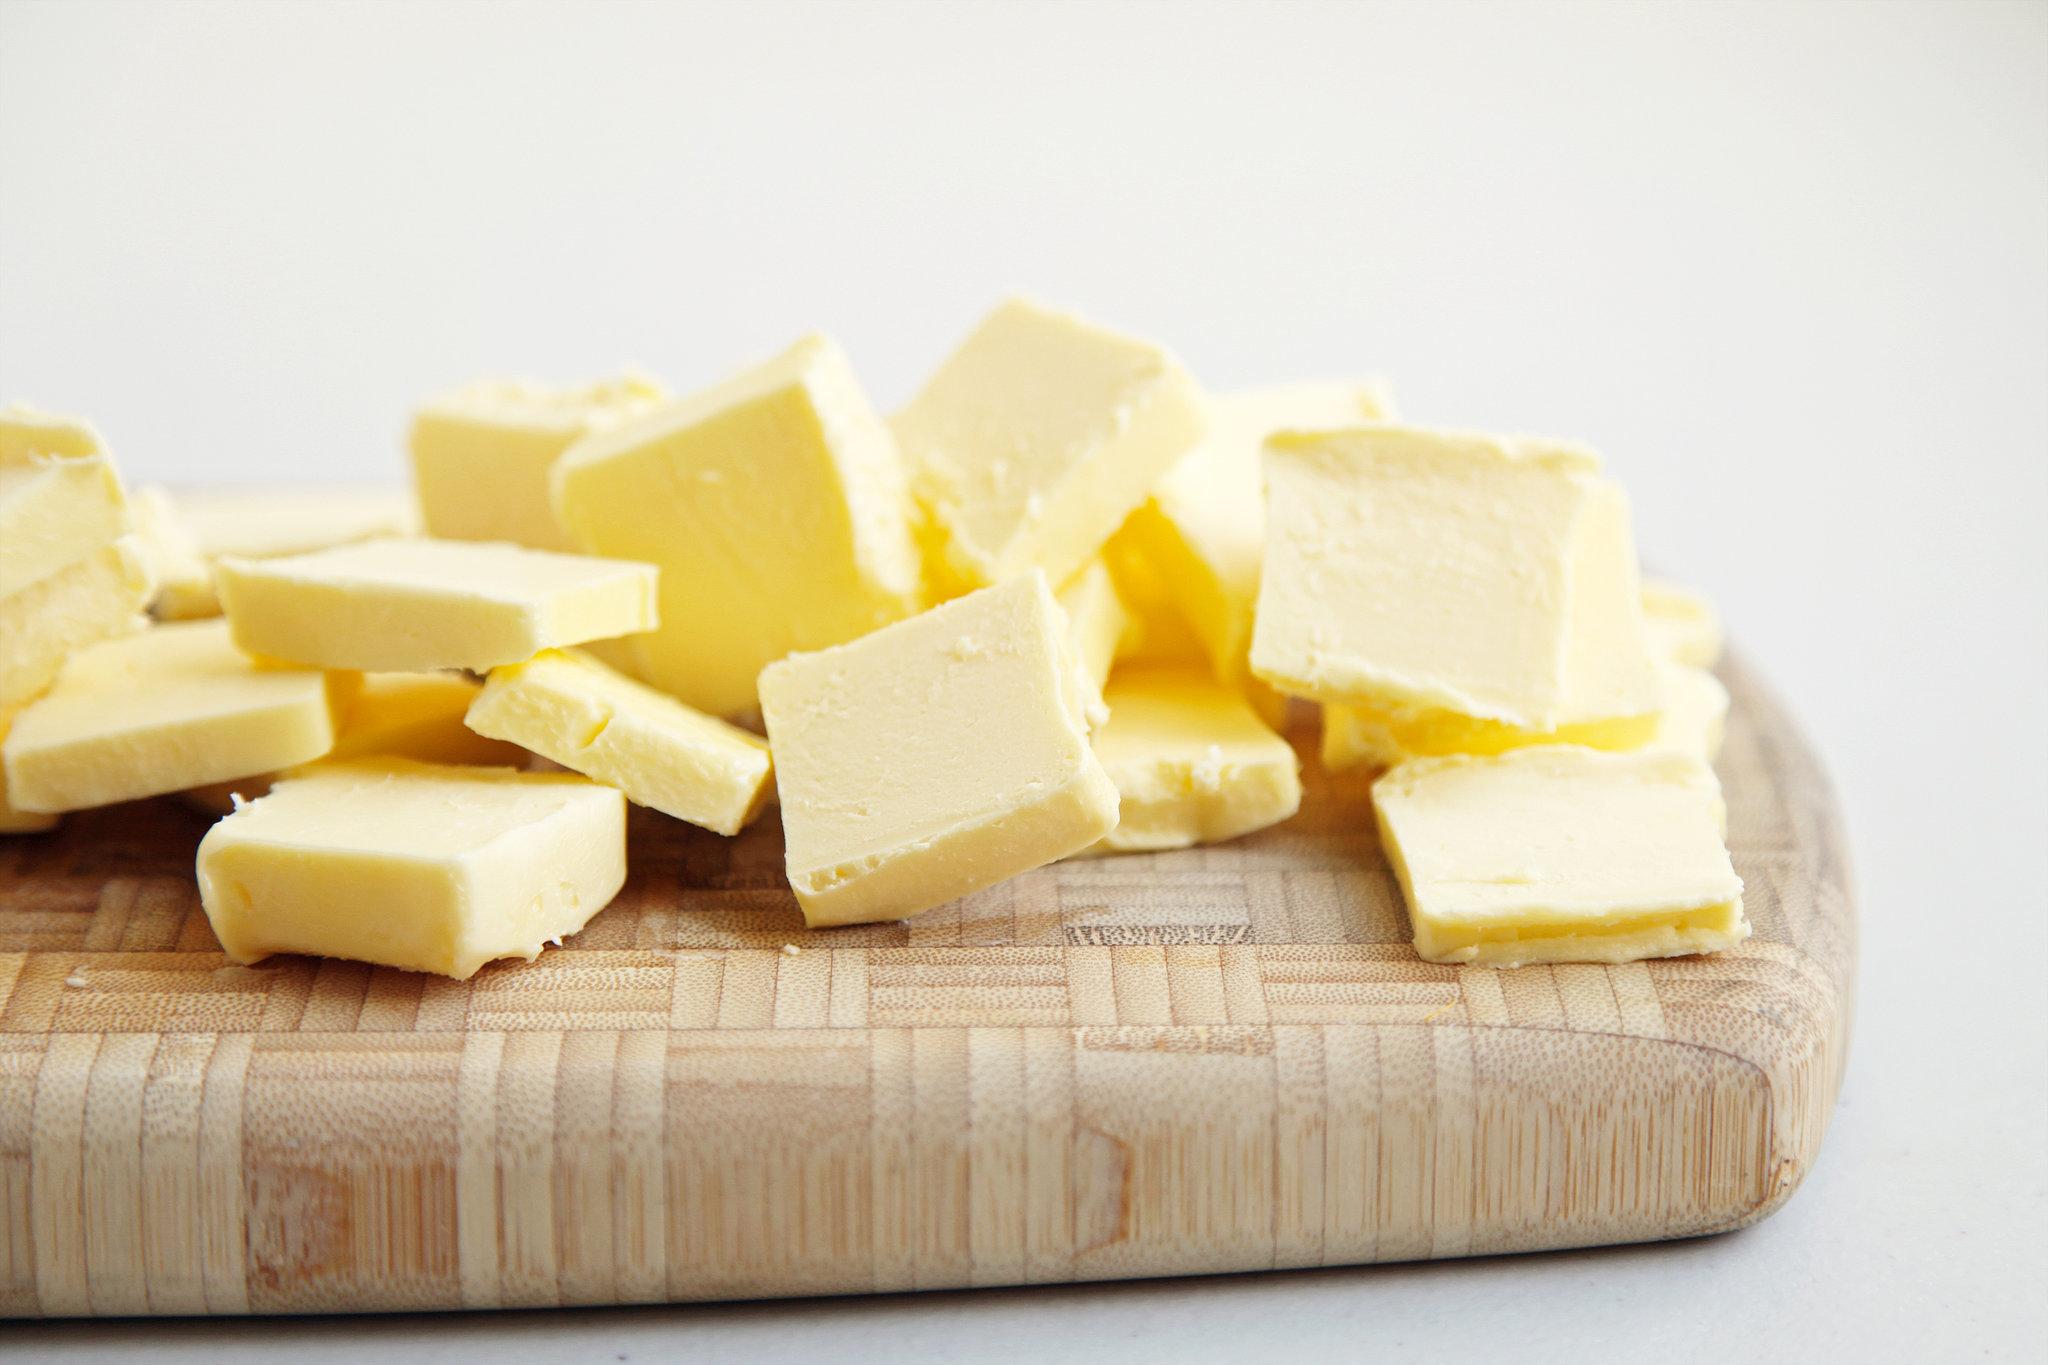 Butter Olive Oil 00125